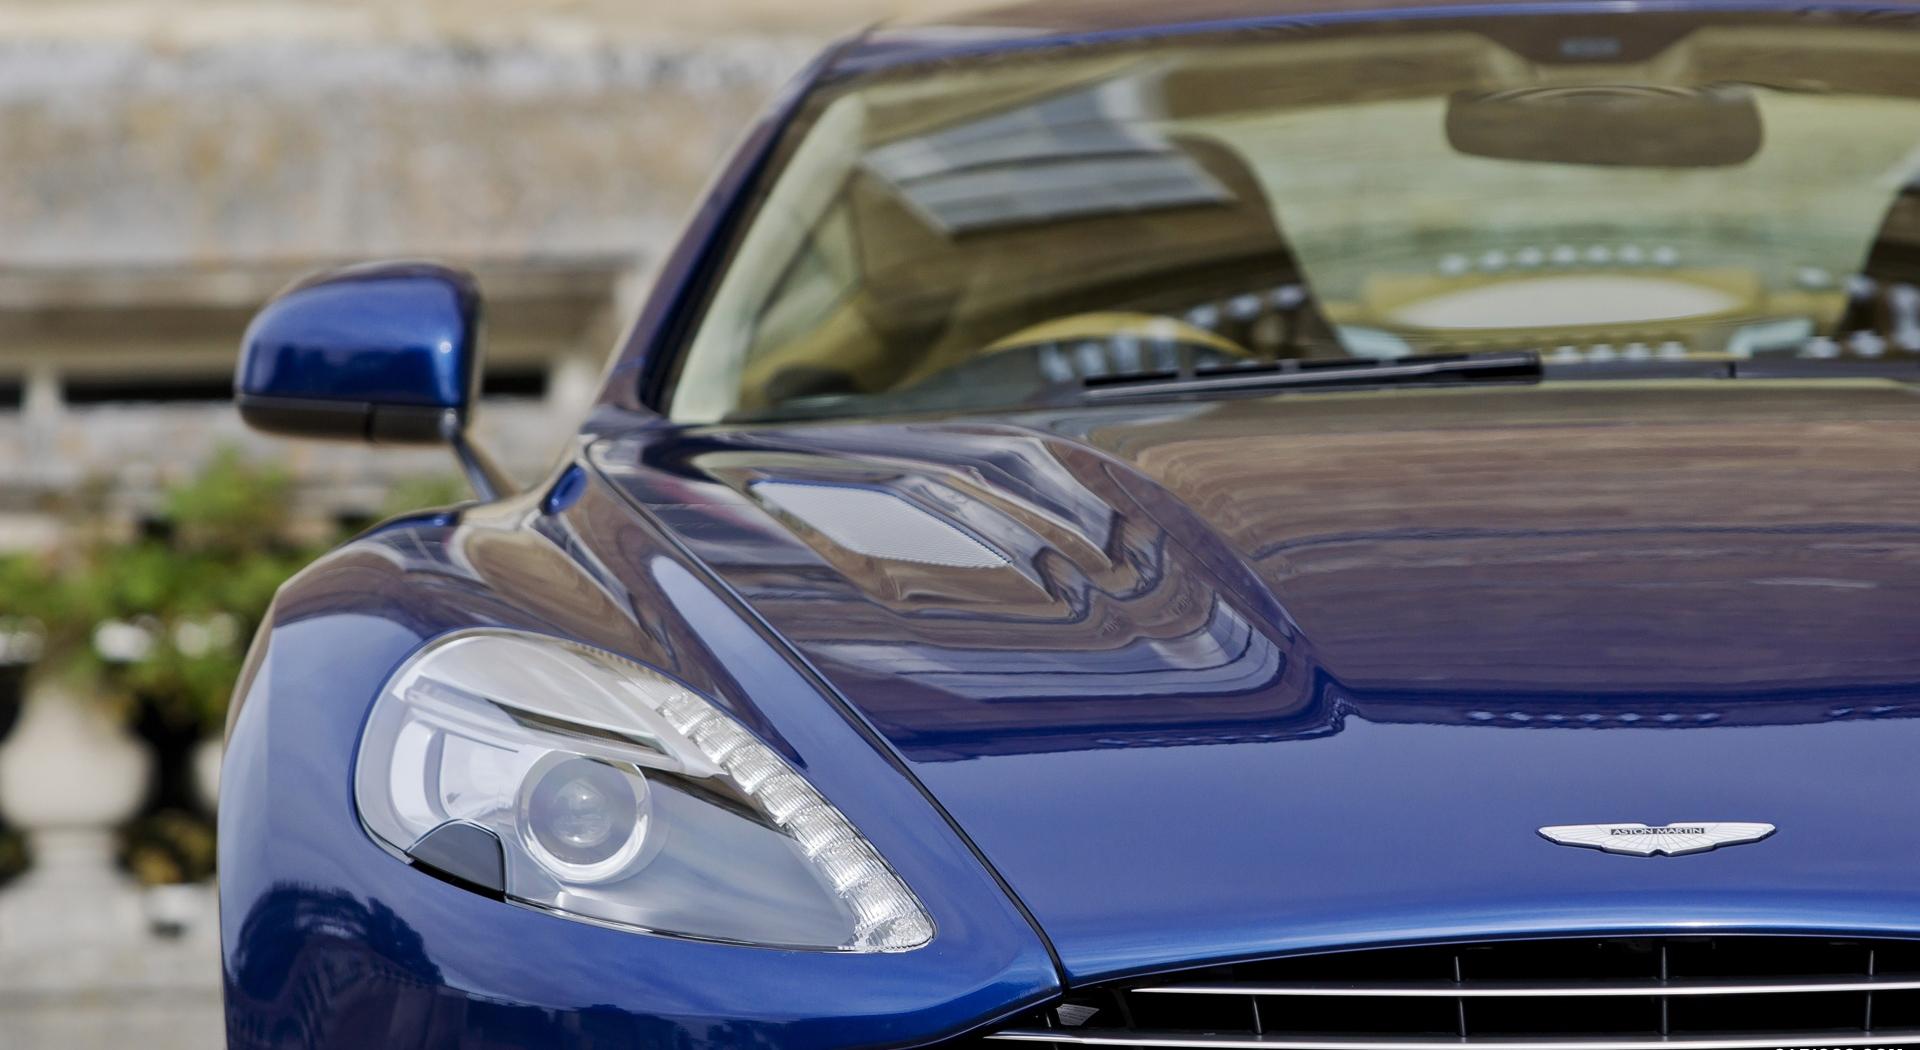 Aston Martin Vanquish images A1